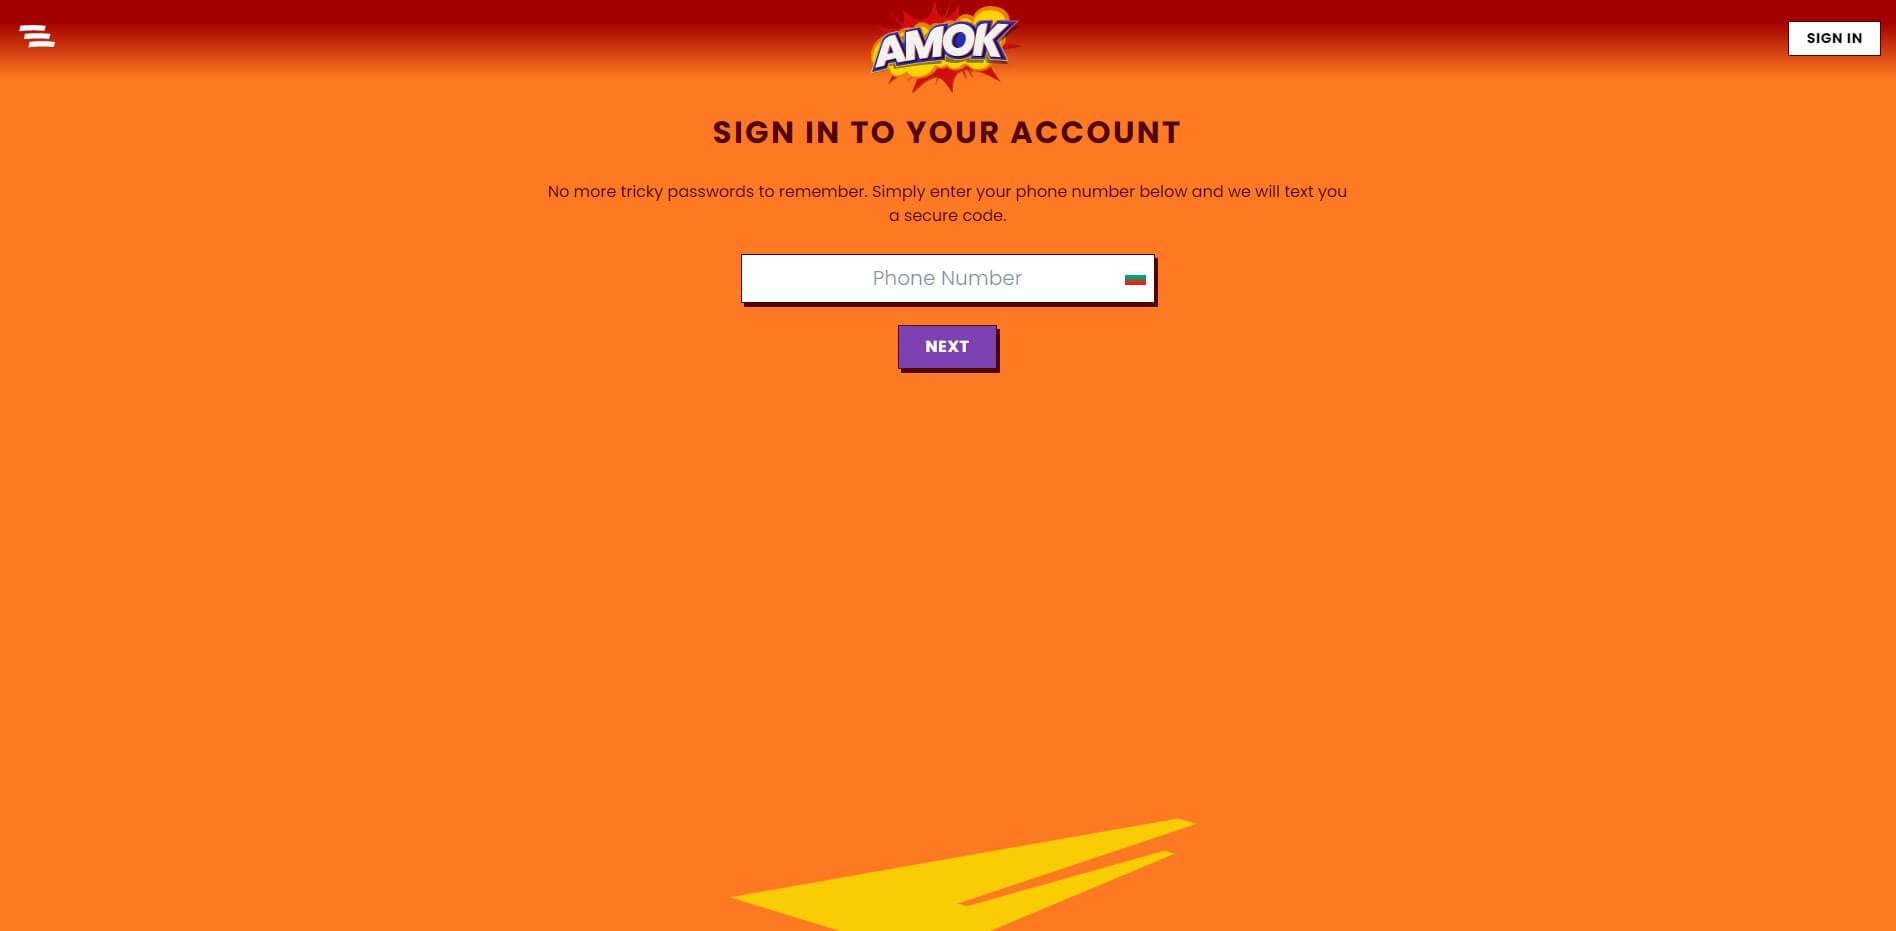 Sign Up at Amok Casino